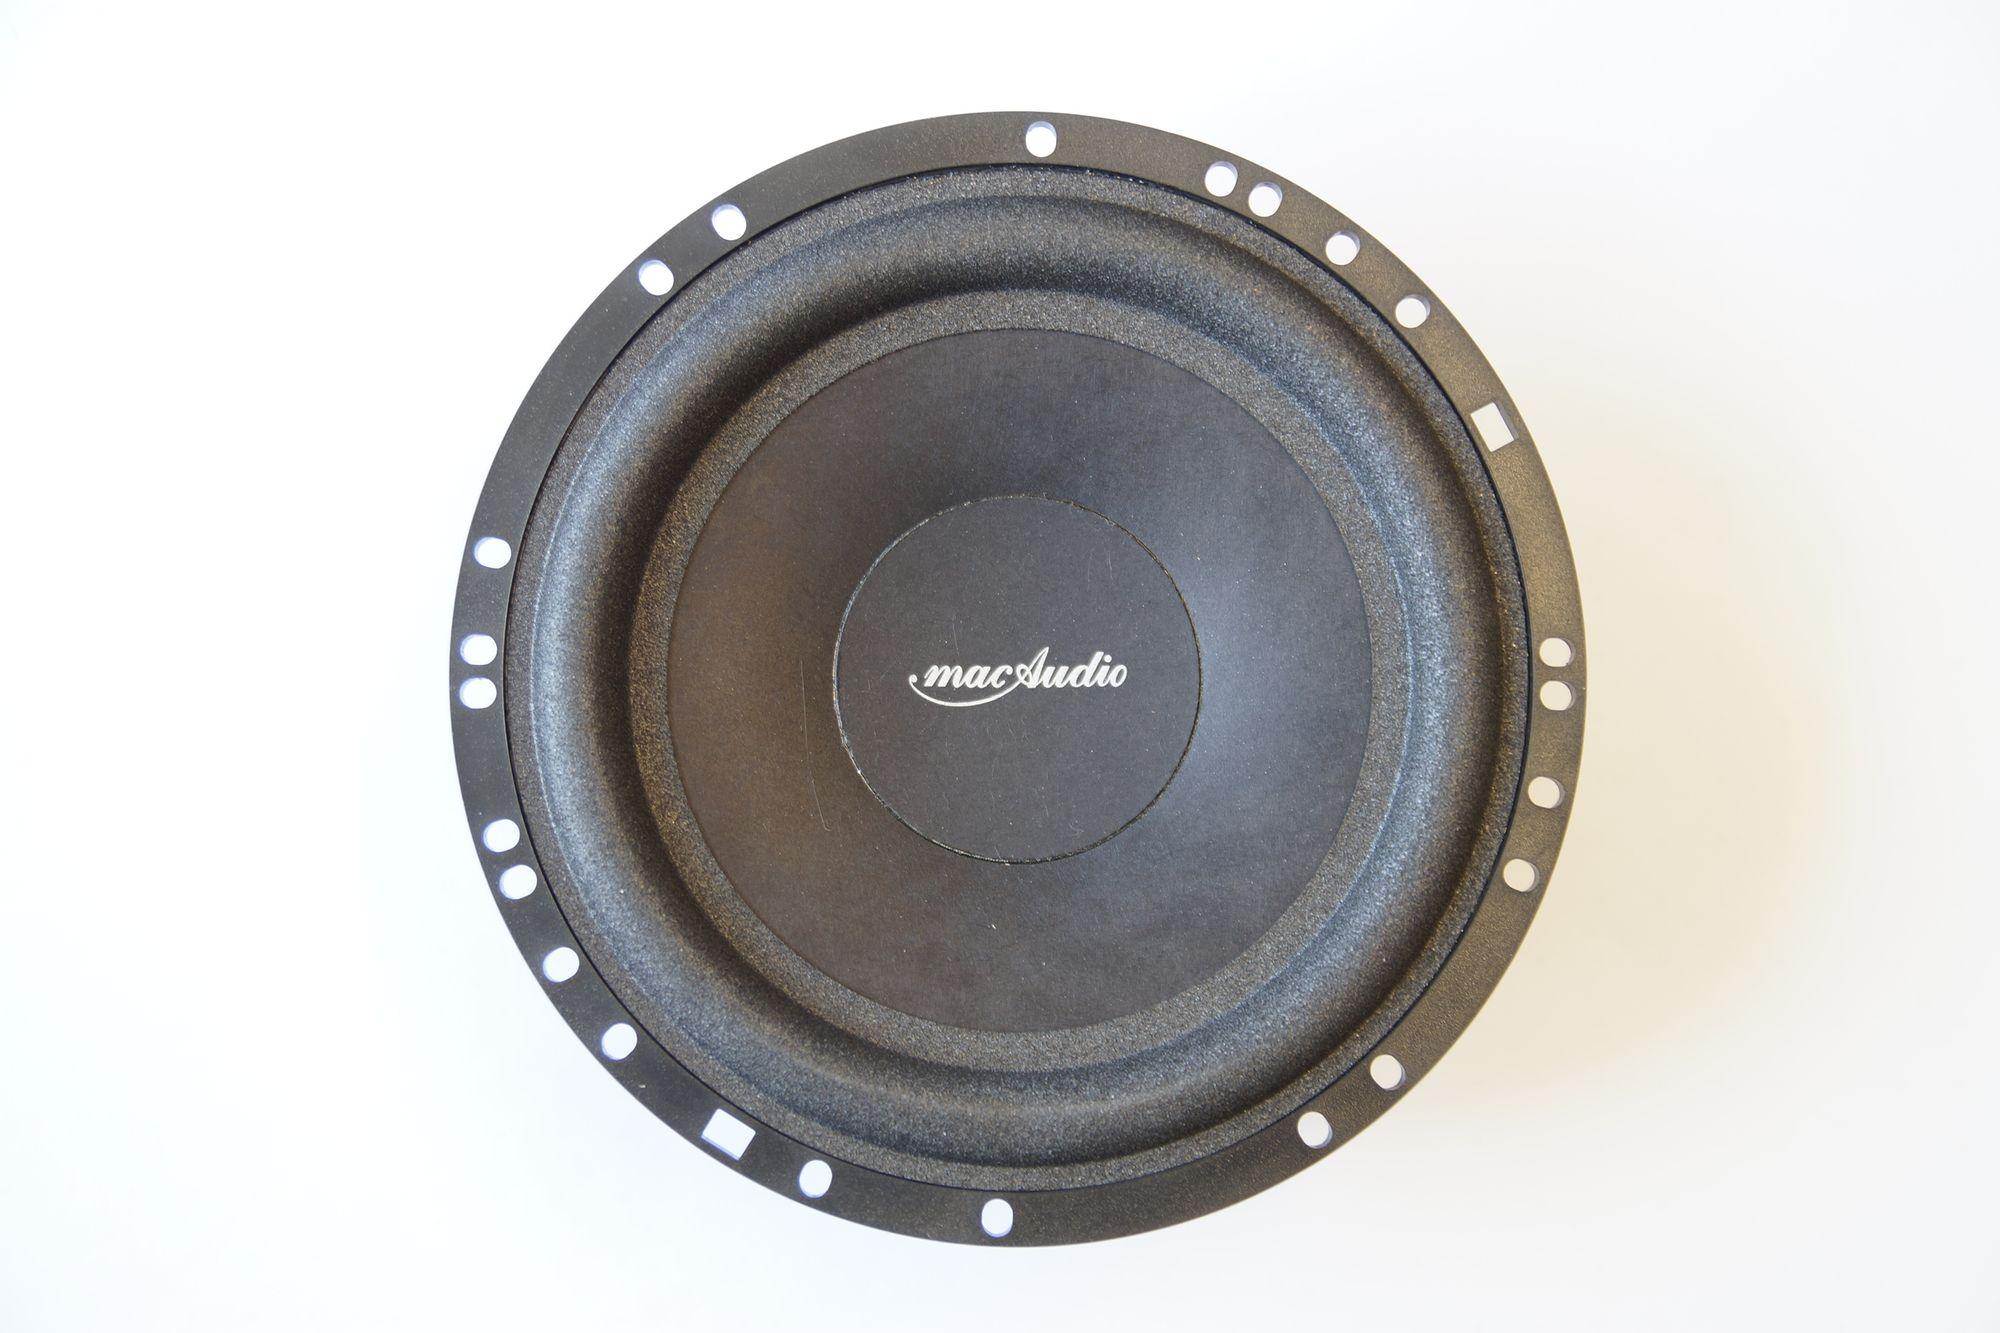 Mac Audio Reference 2.16 Tieftöner 16 cm Basslautsprecher 1 Paar Neu